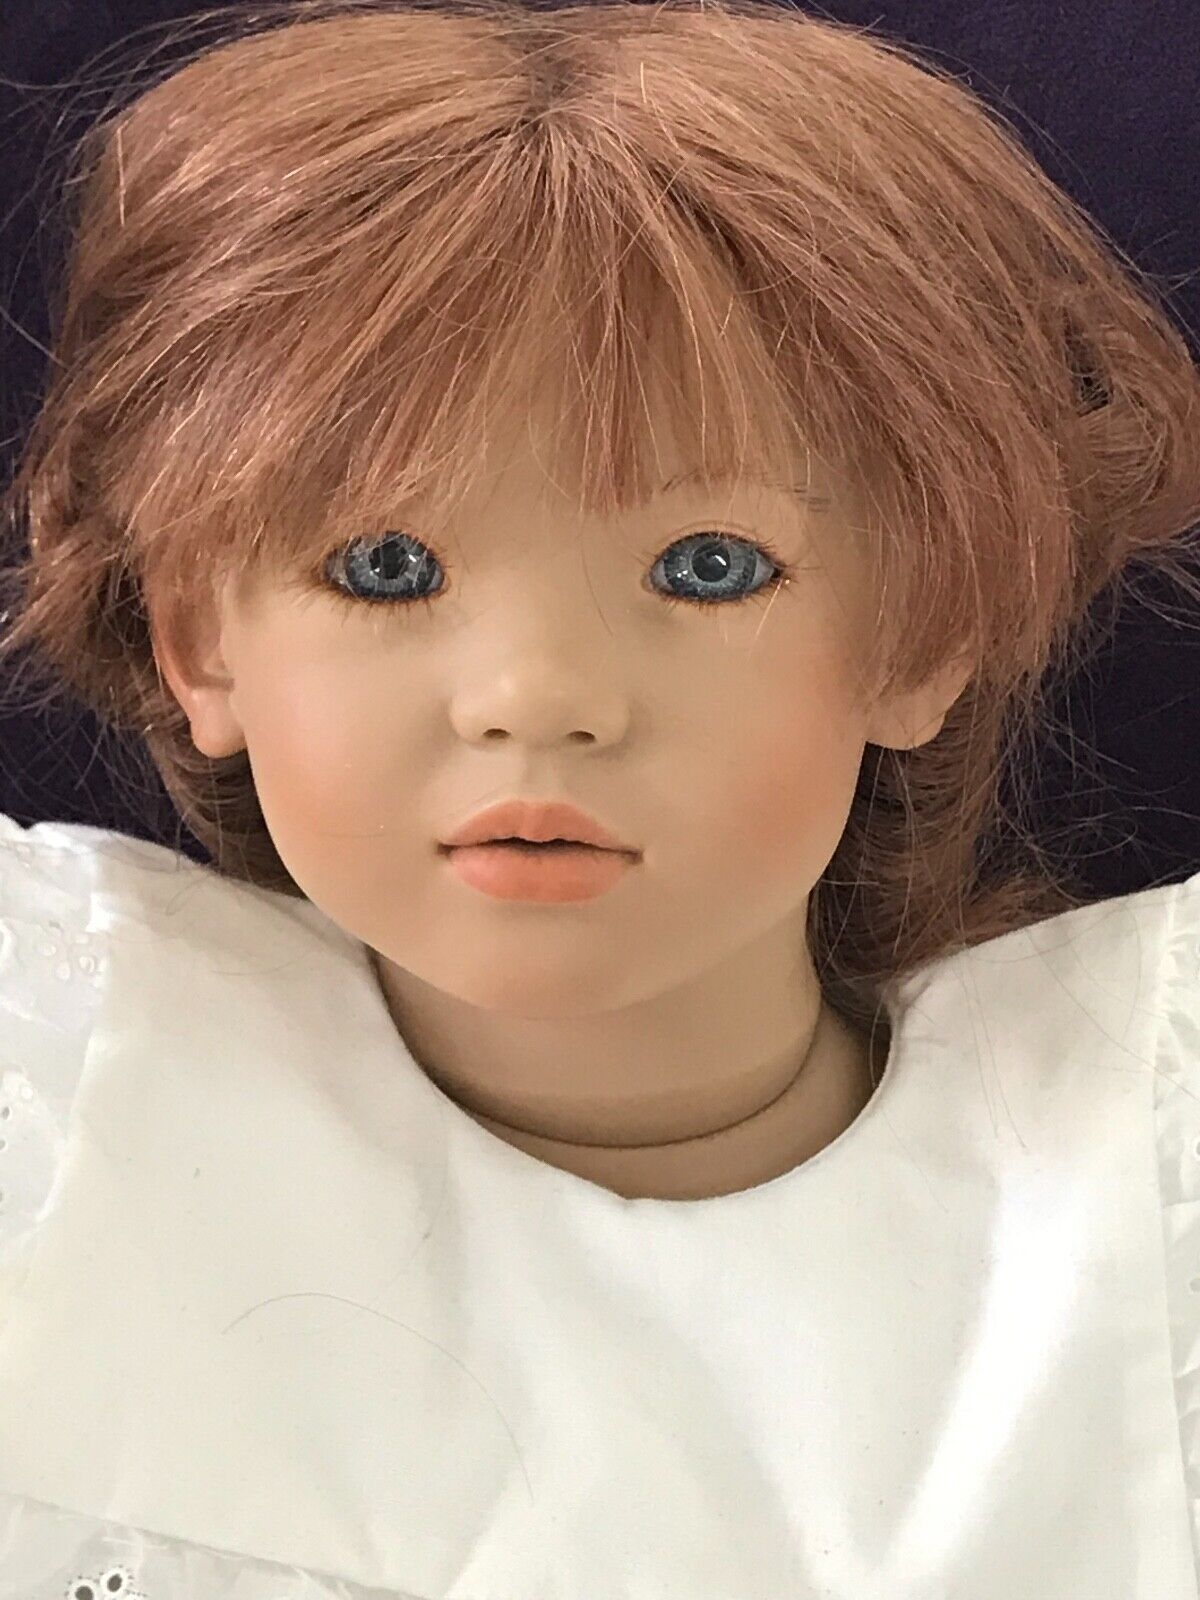 VTG 1991-92 Liliane by Annette Himstedt a Puppen Kinder doll w/box/COA by Mattel